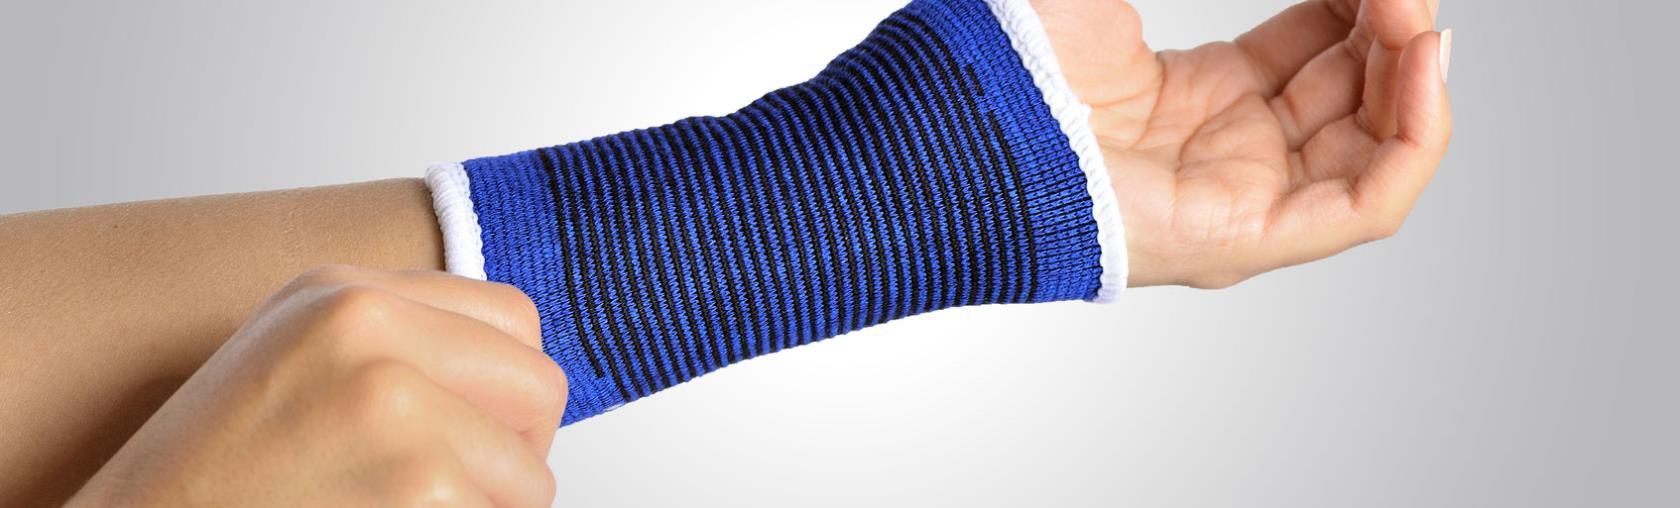 Articoli sanitari e ortopedici Orthopharm 2.0